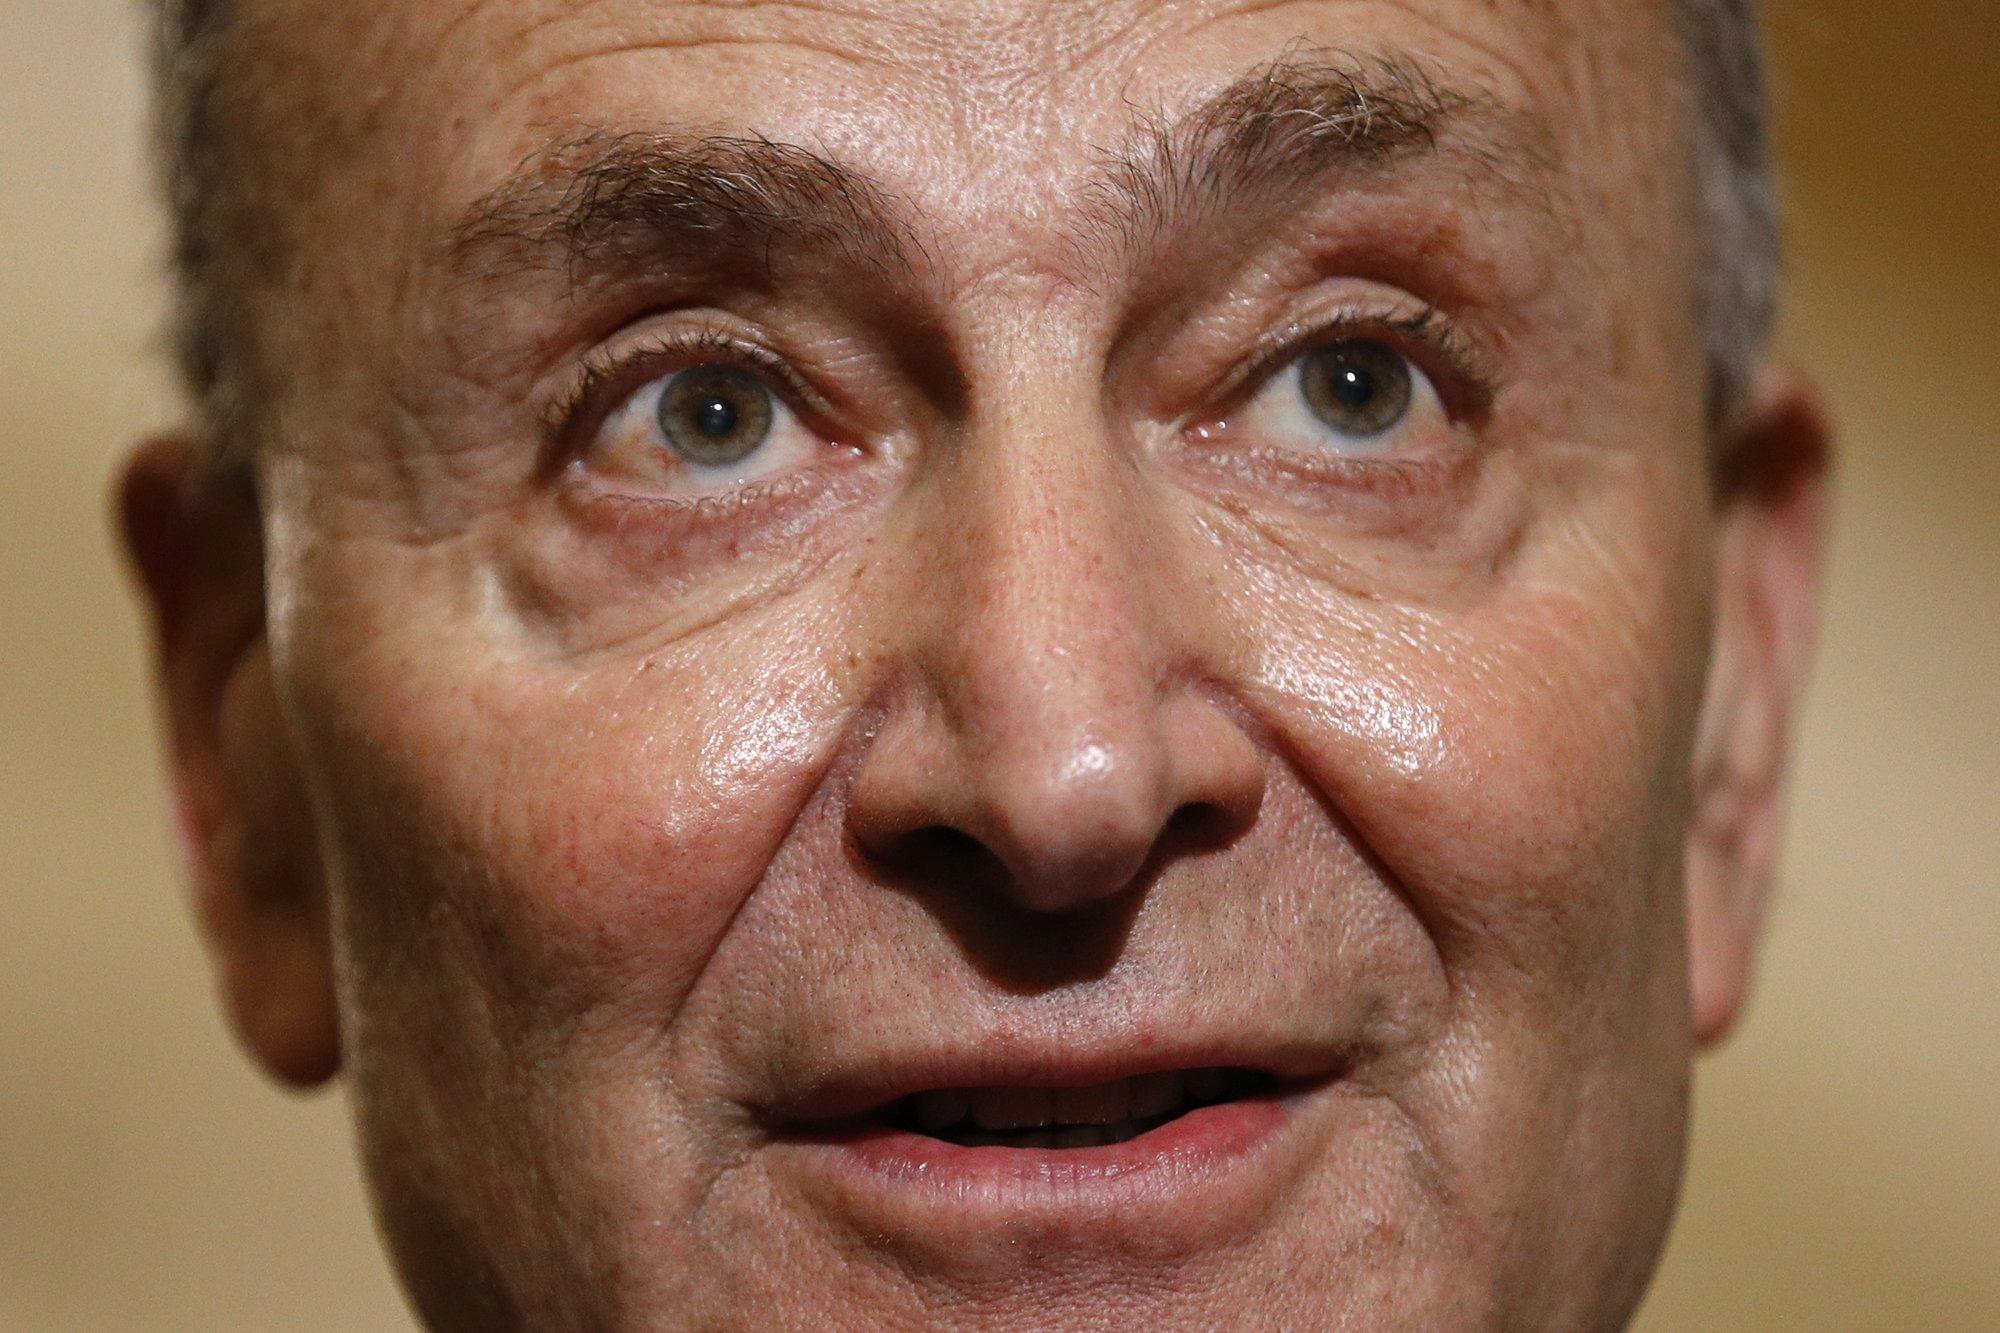 Democrats face setbacks in recruiting top Senate candidates